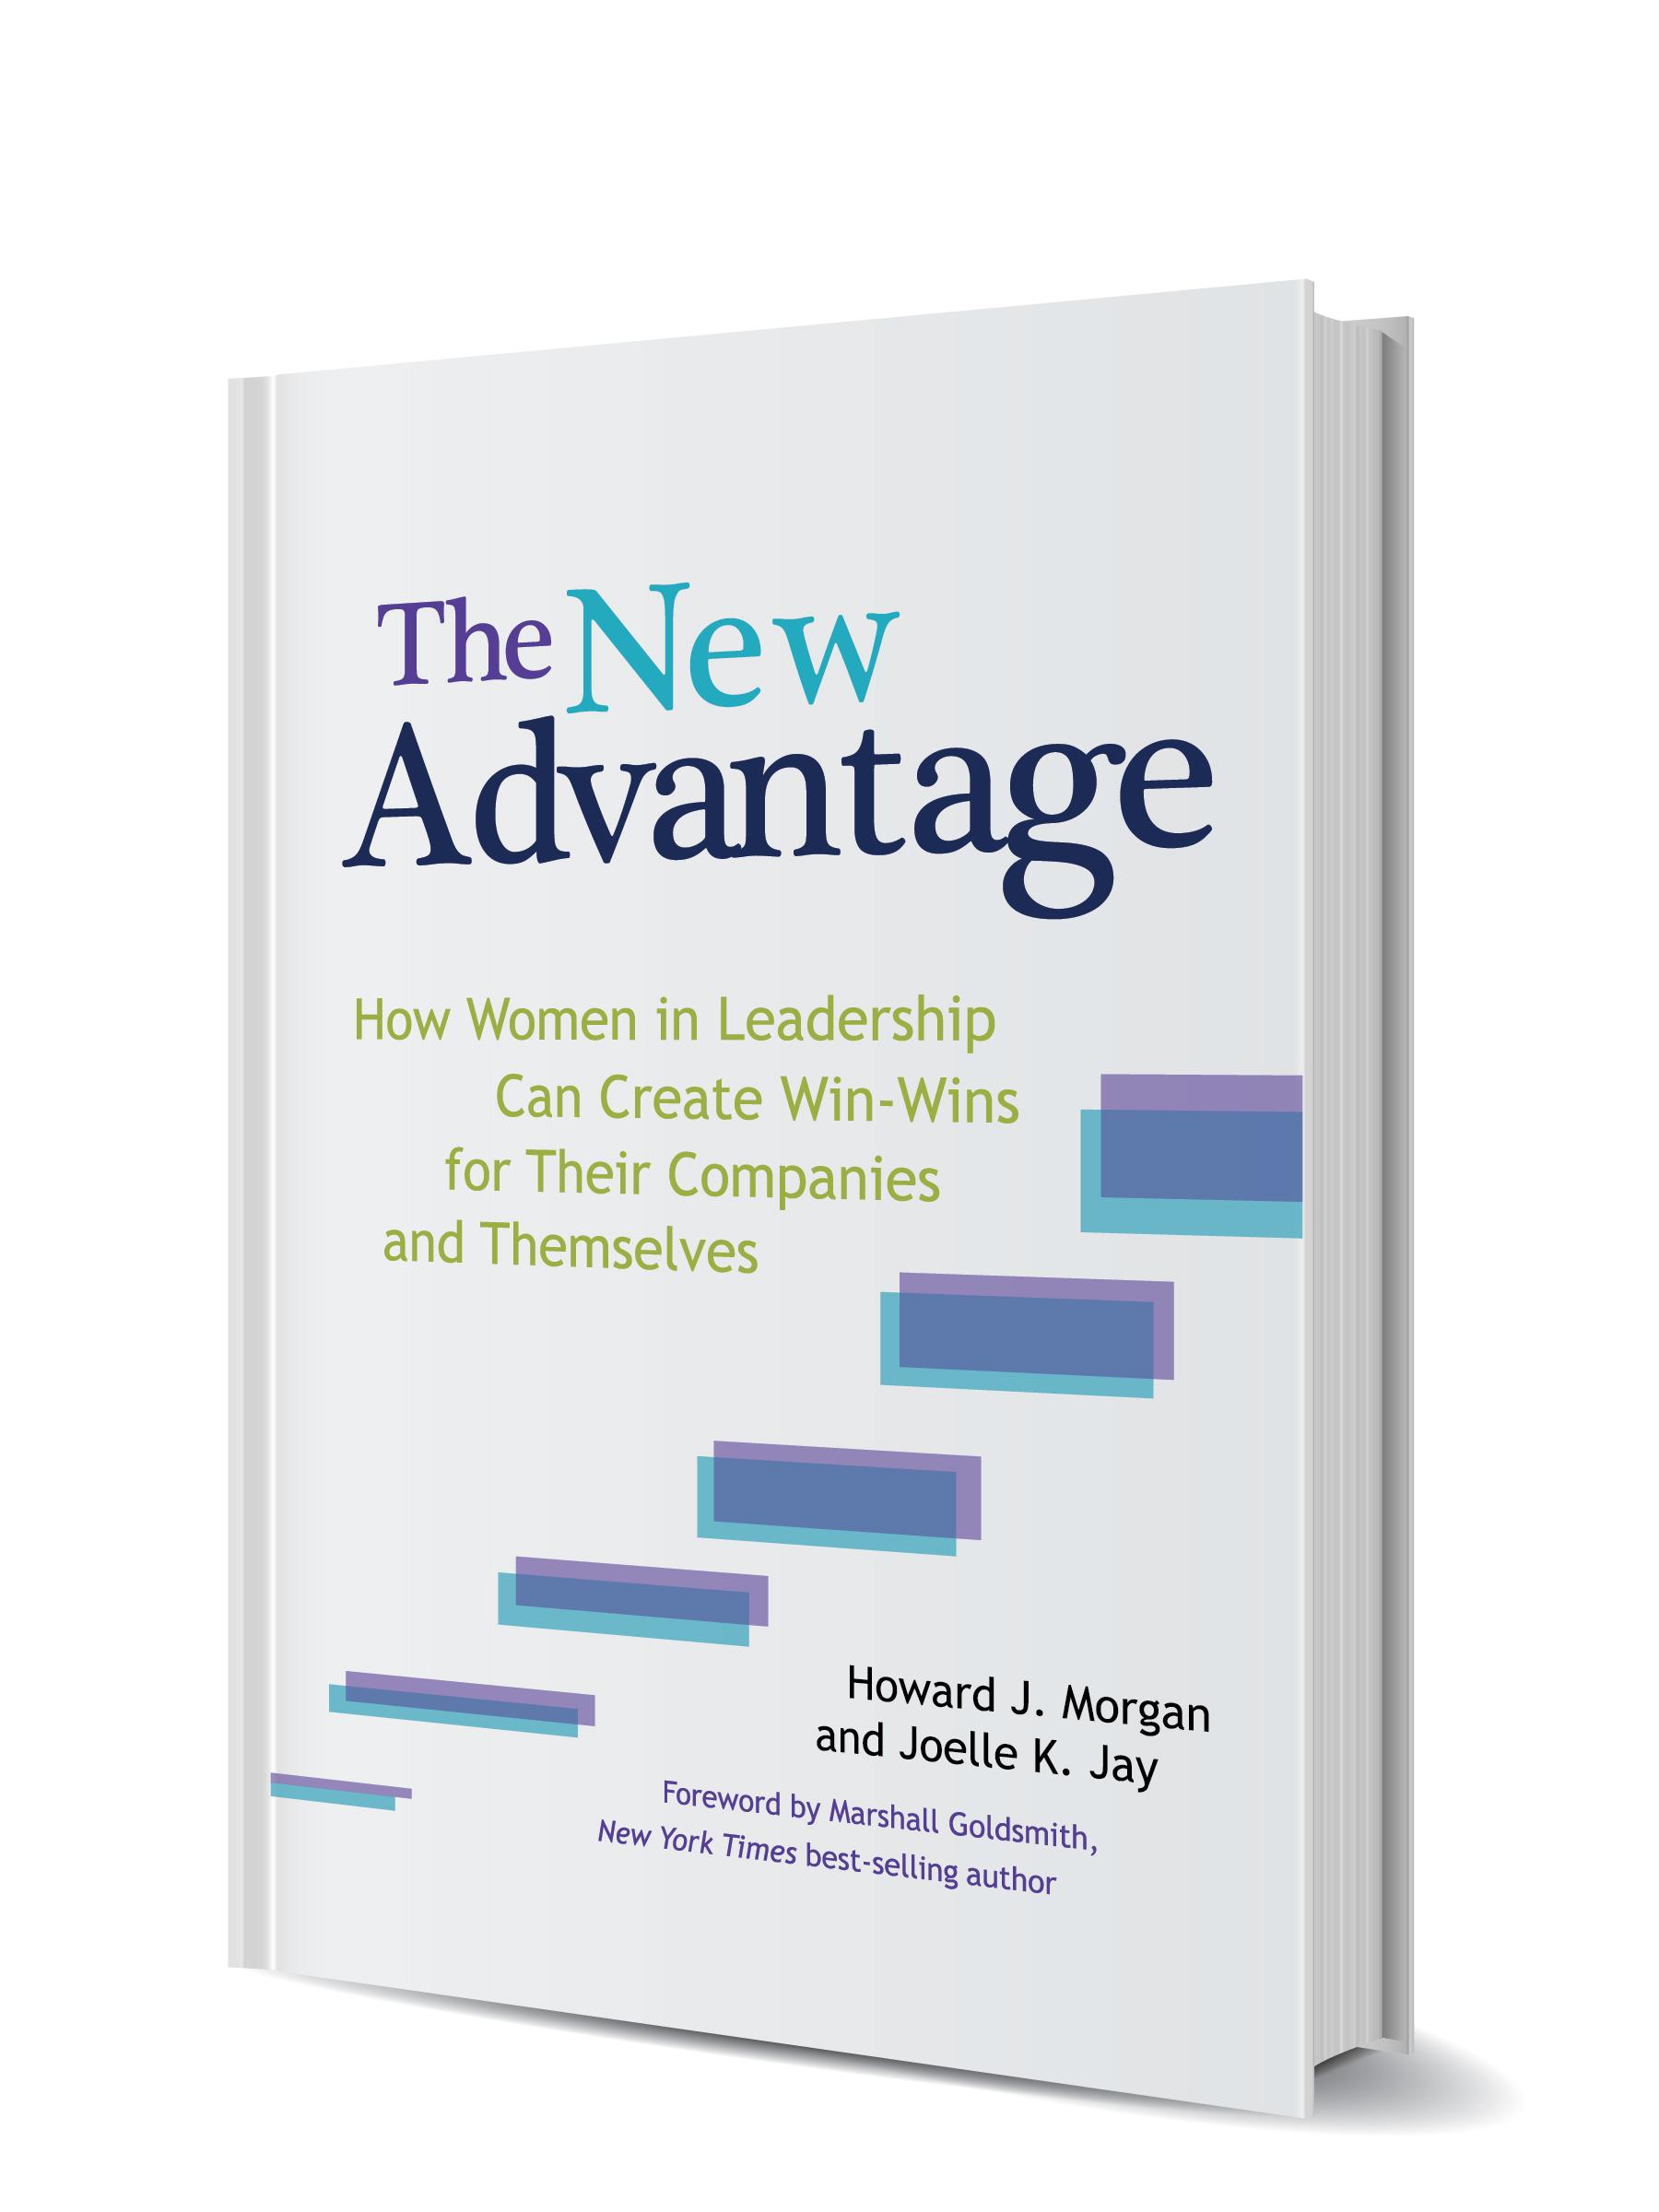 The New Advantage